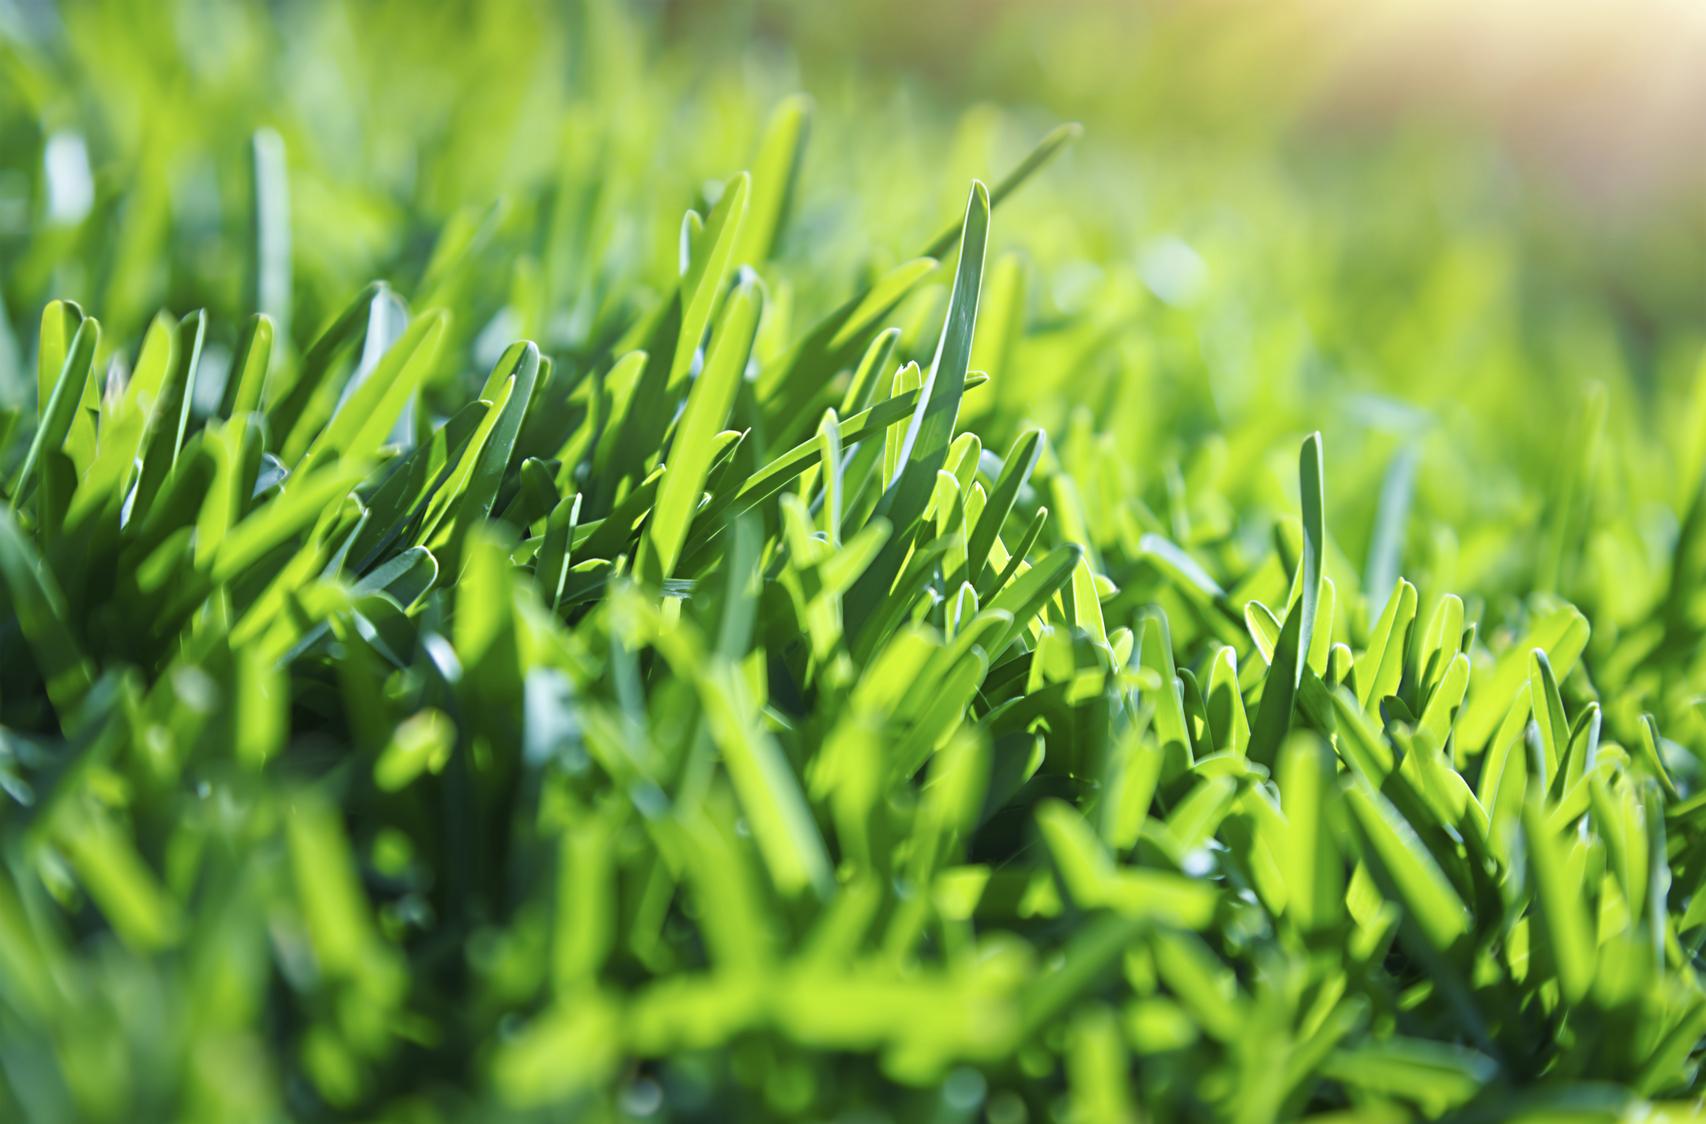 bright green blades of grass